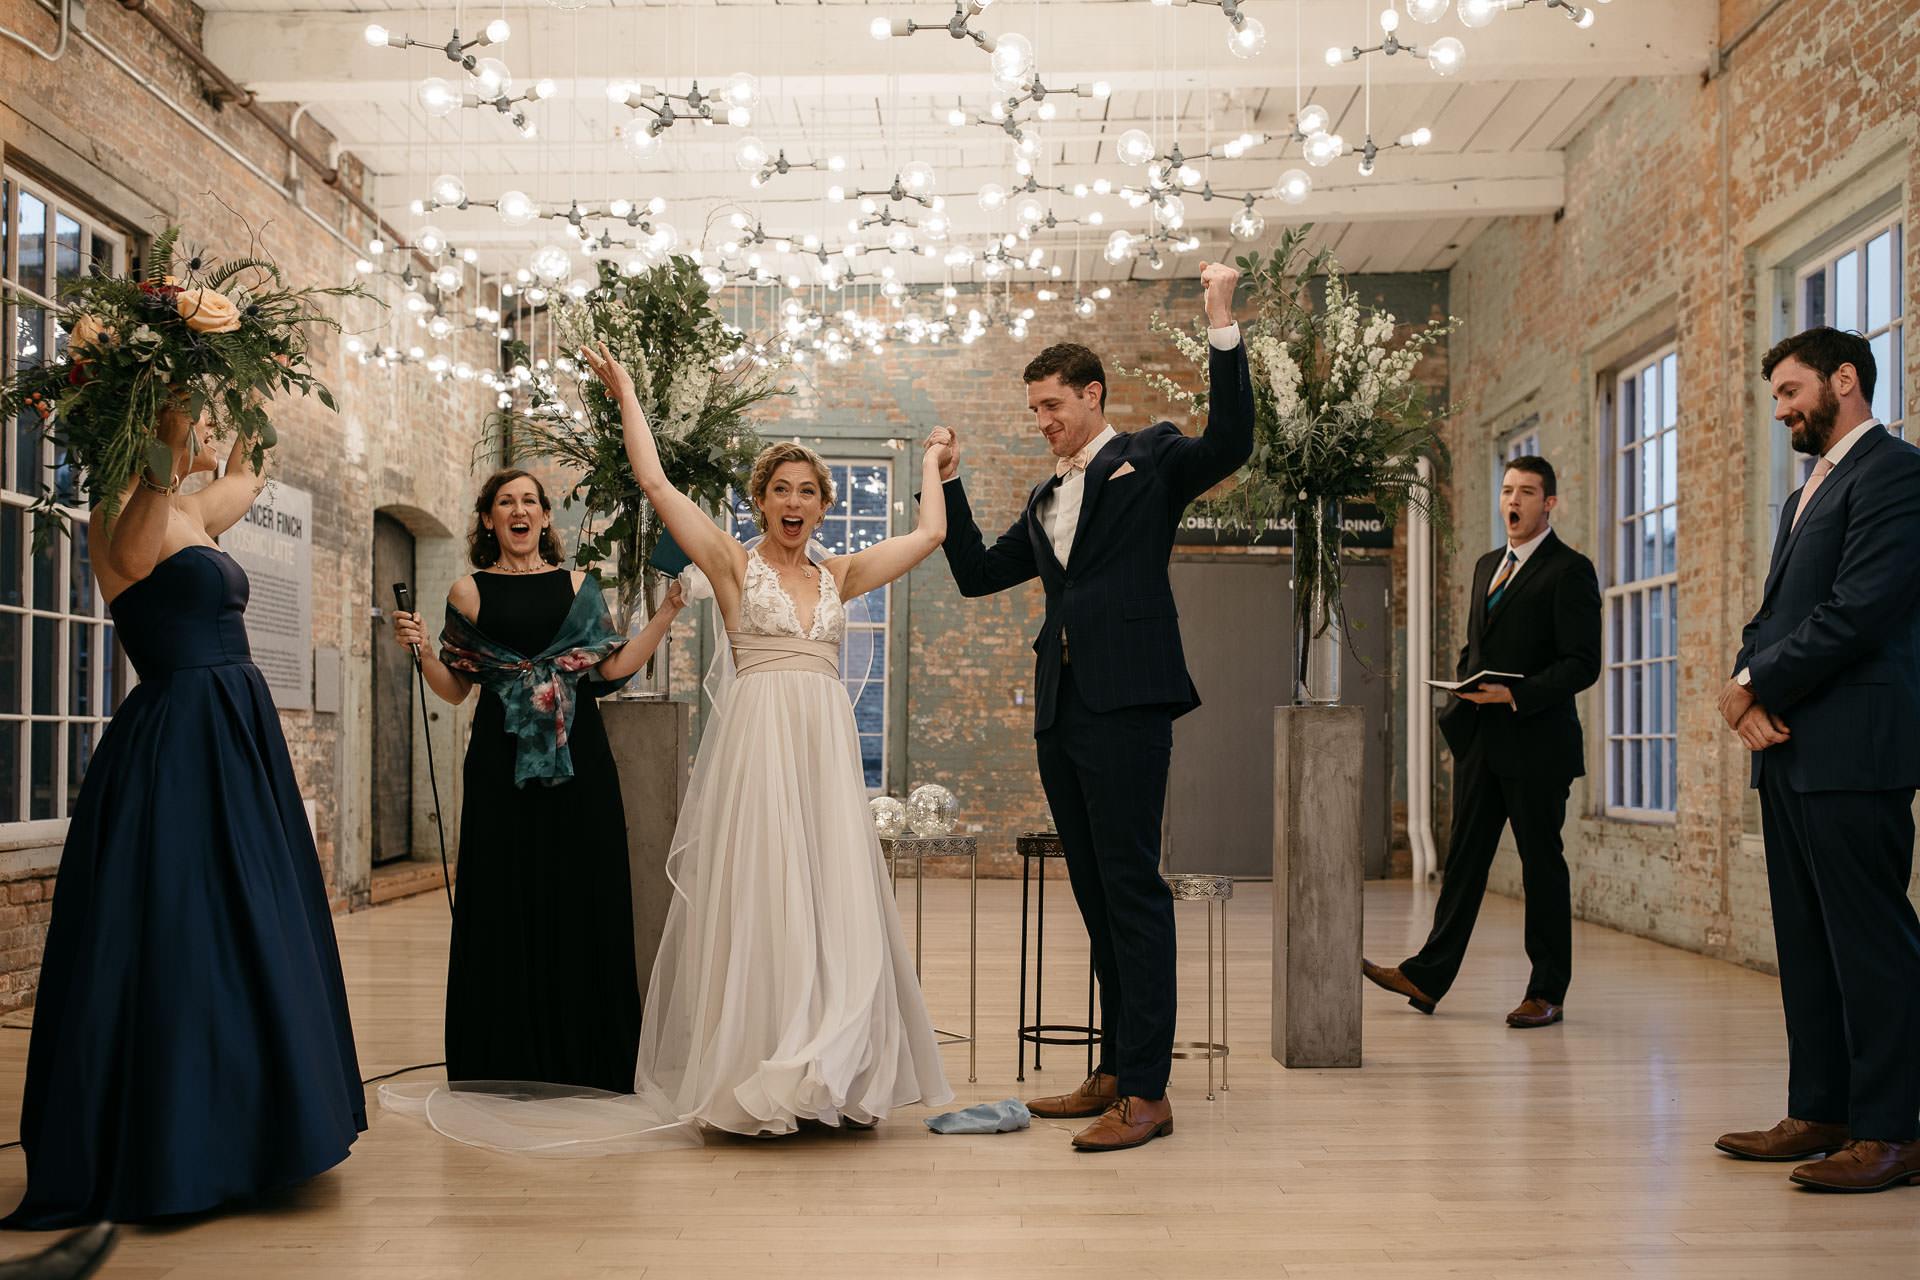 Machusetts Wedding Photographer M Moca Museum In North Adams By Jean Lau Gaudy